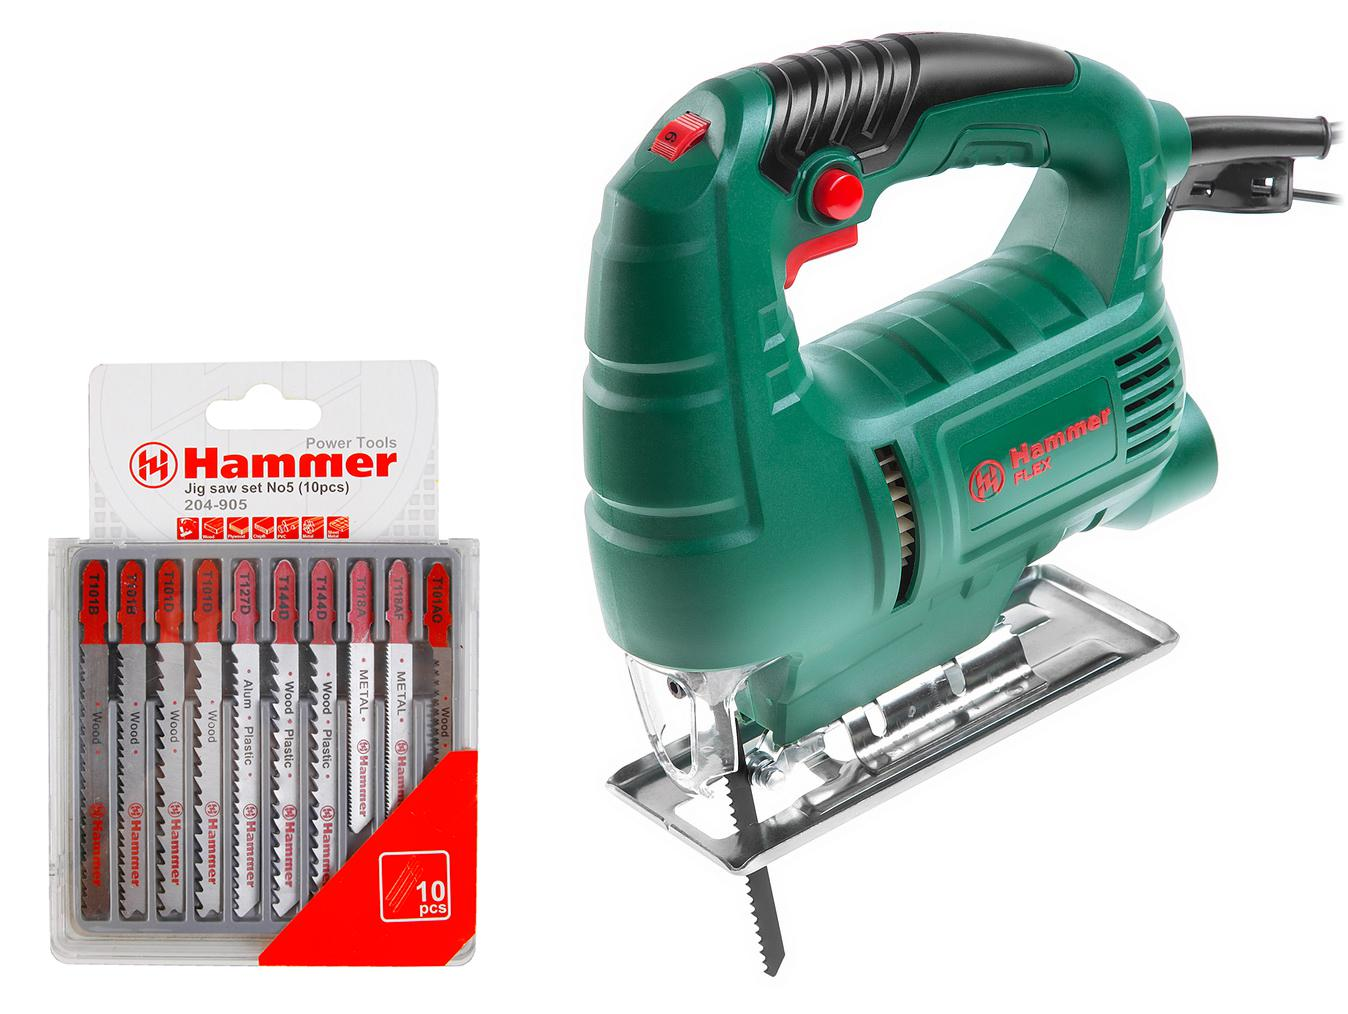 Набор Hammer Лобзик lzk550l + набор пилок 204-905